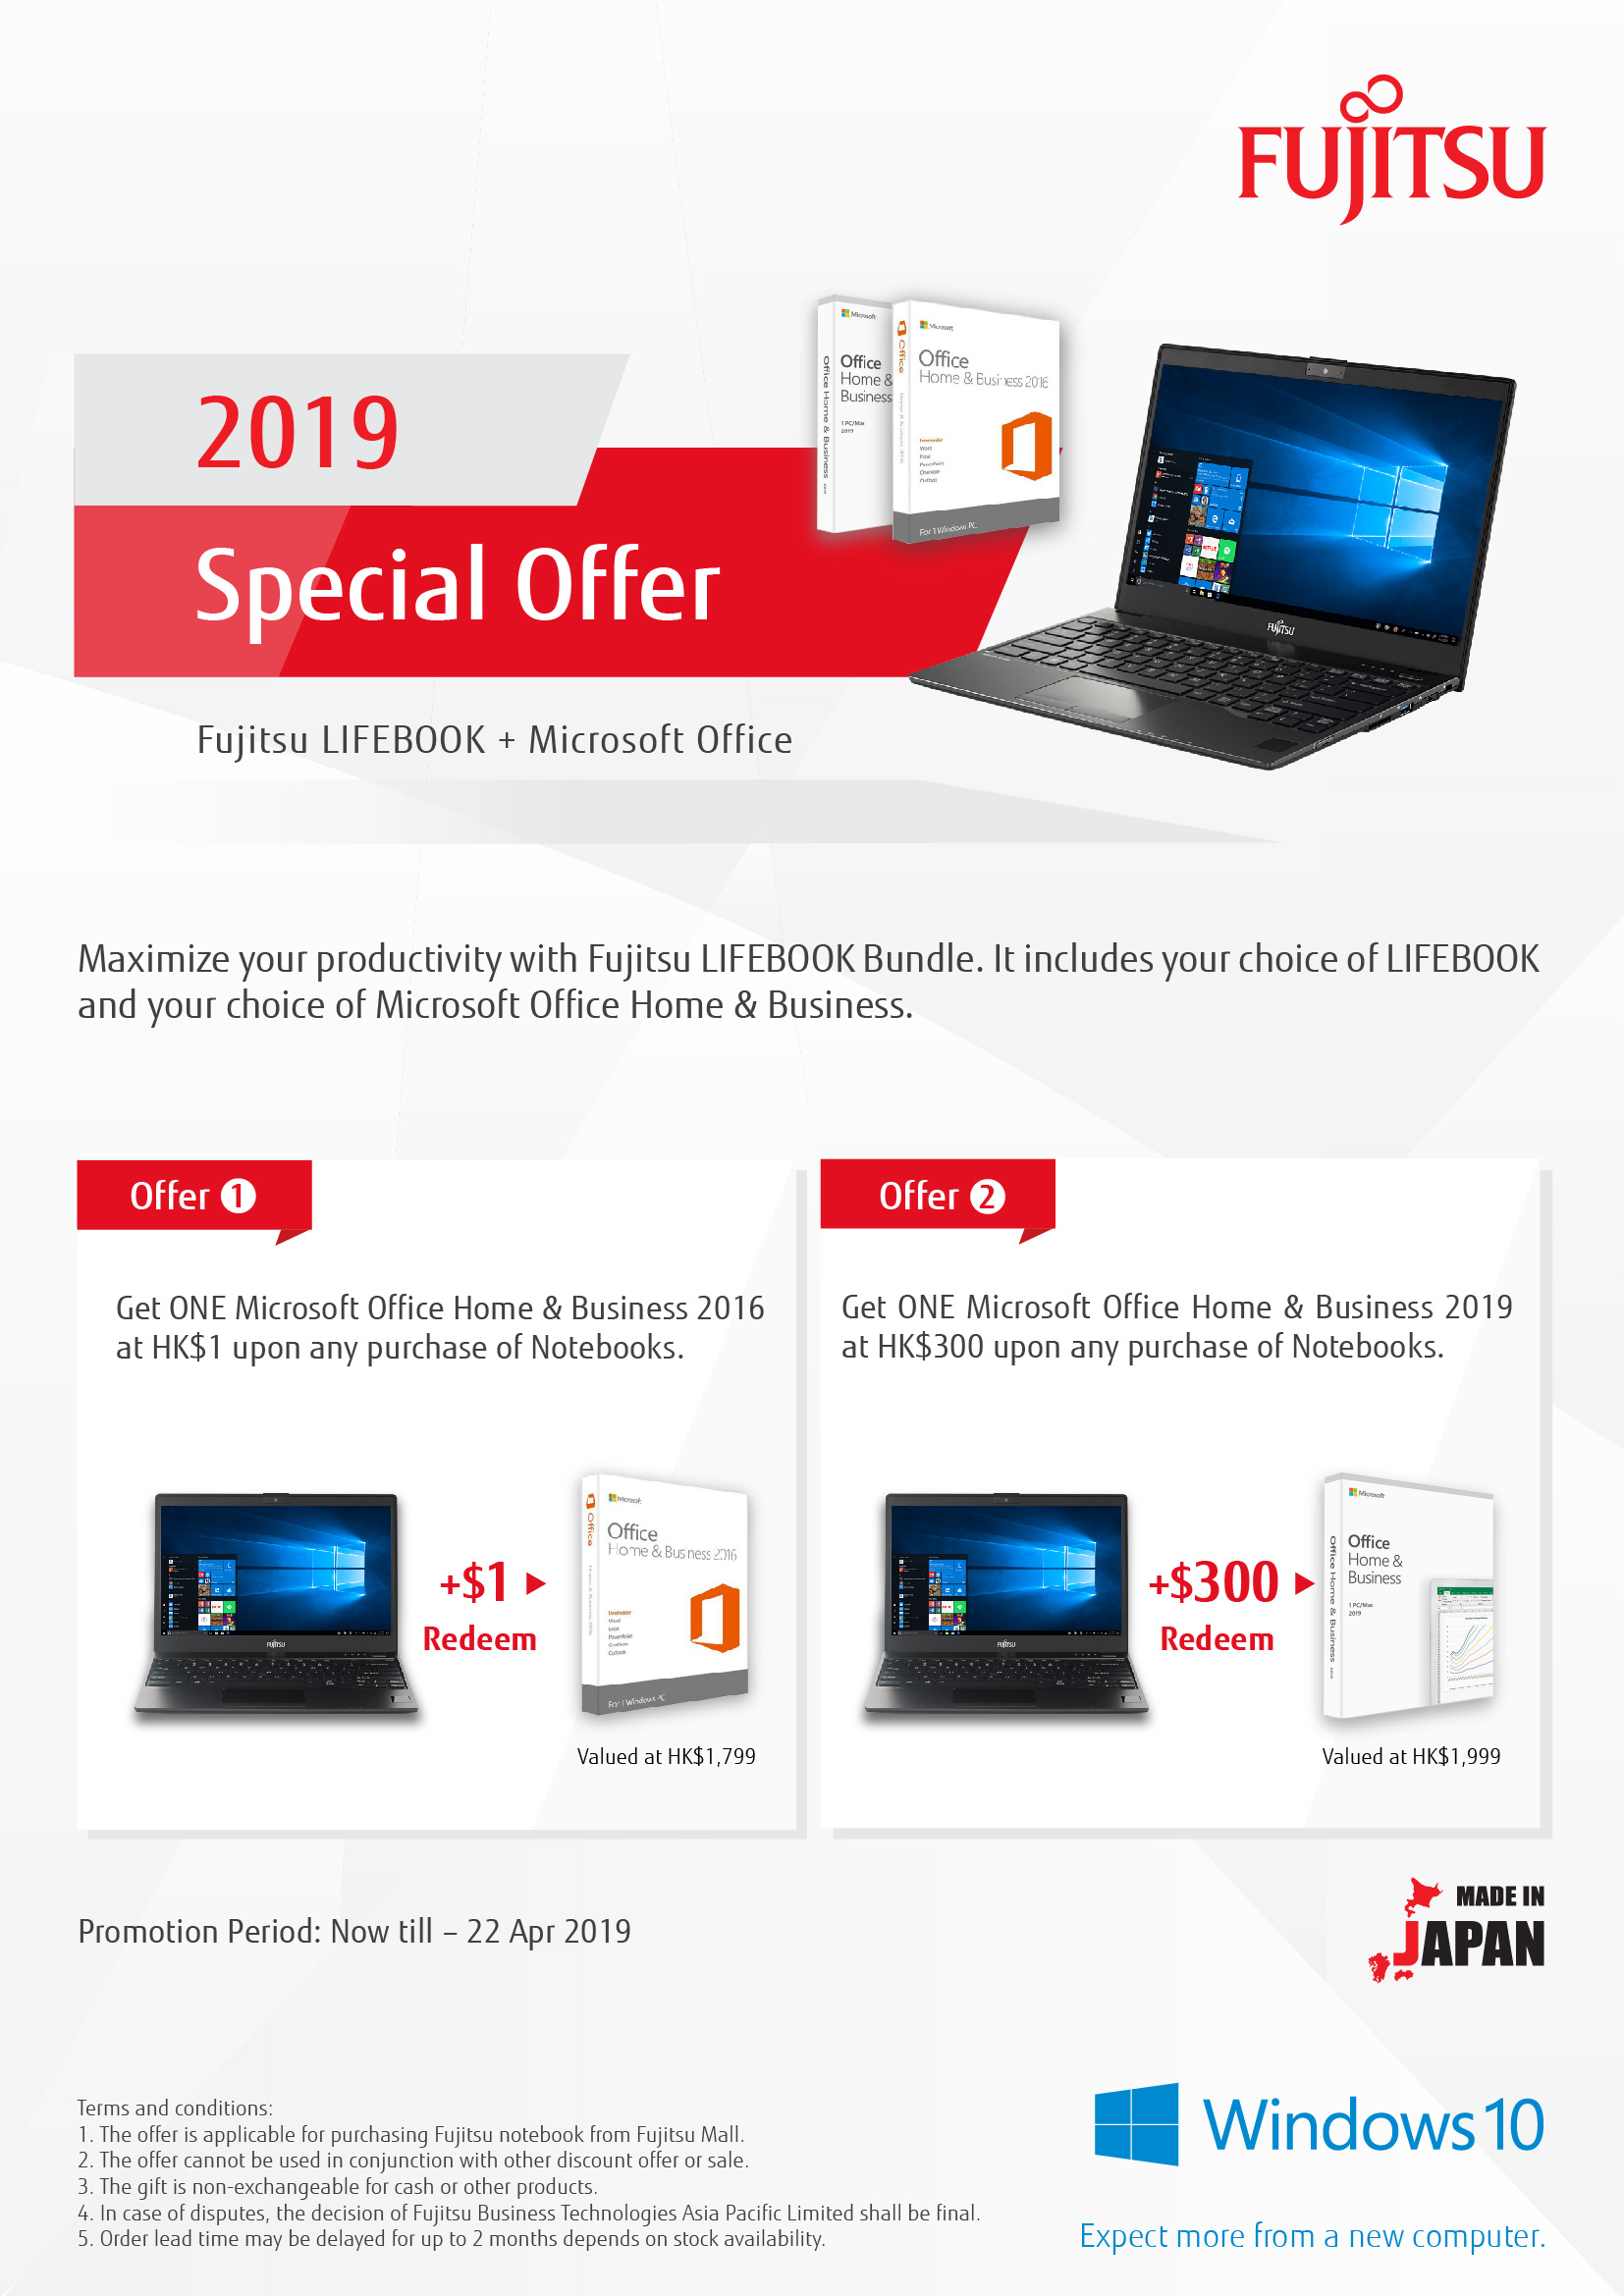 Fujitsu 2019 Special Offer